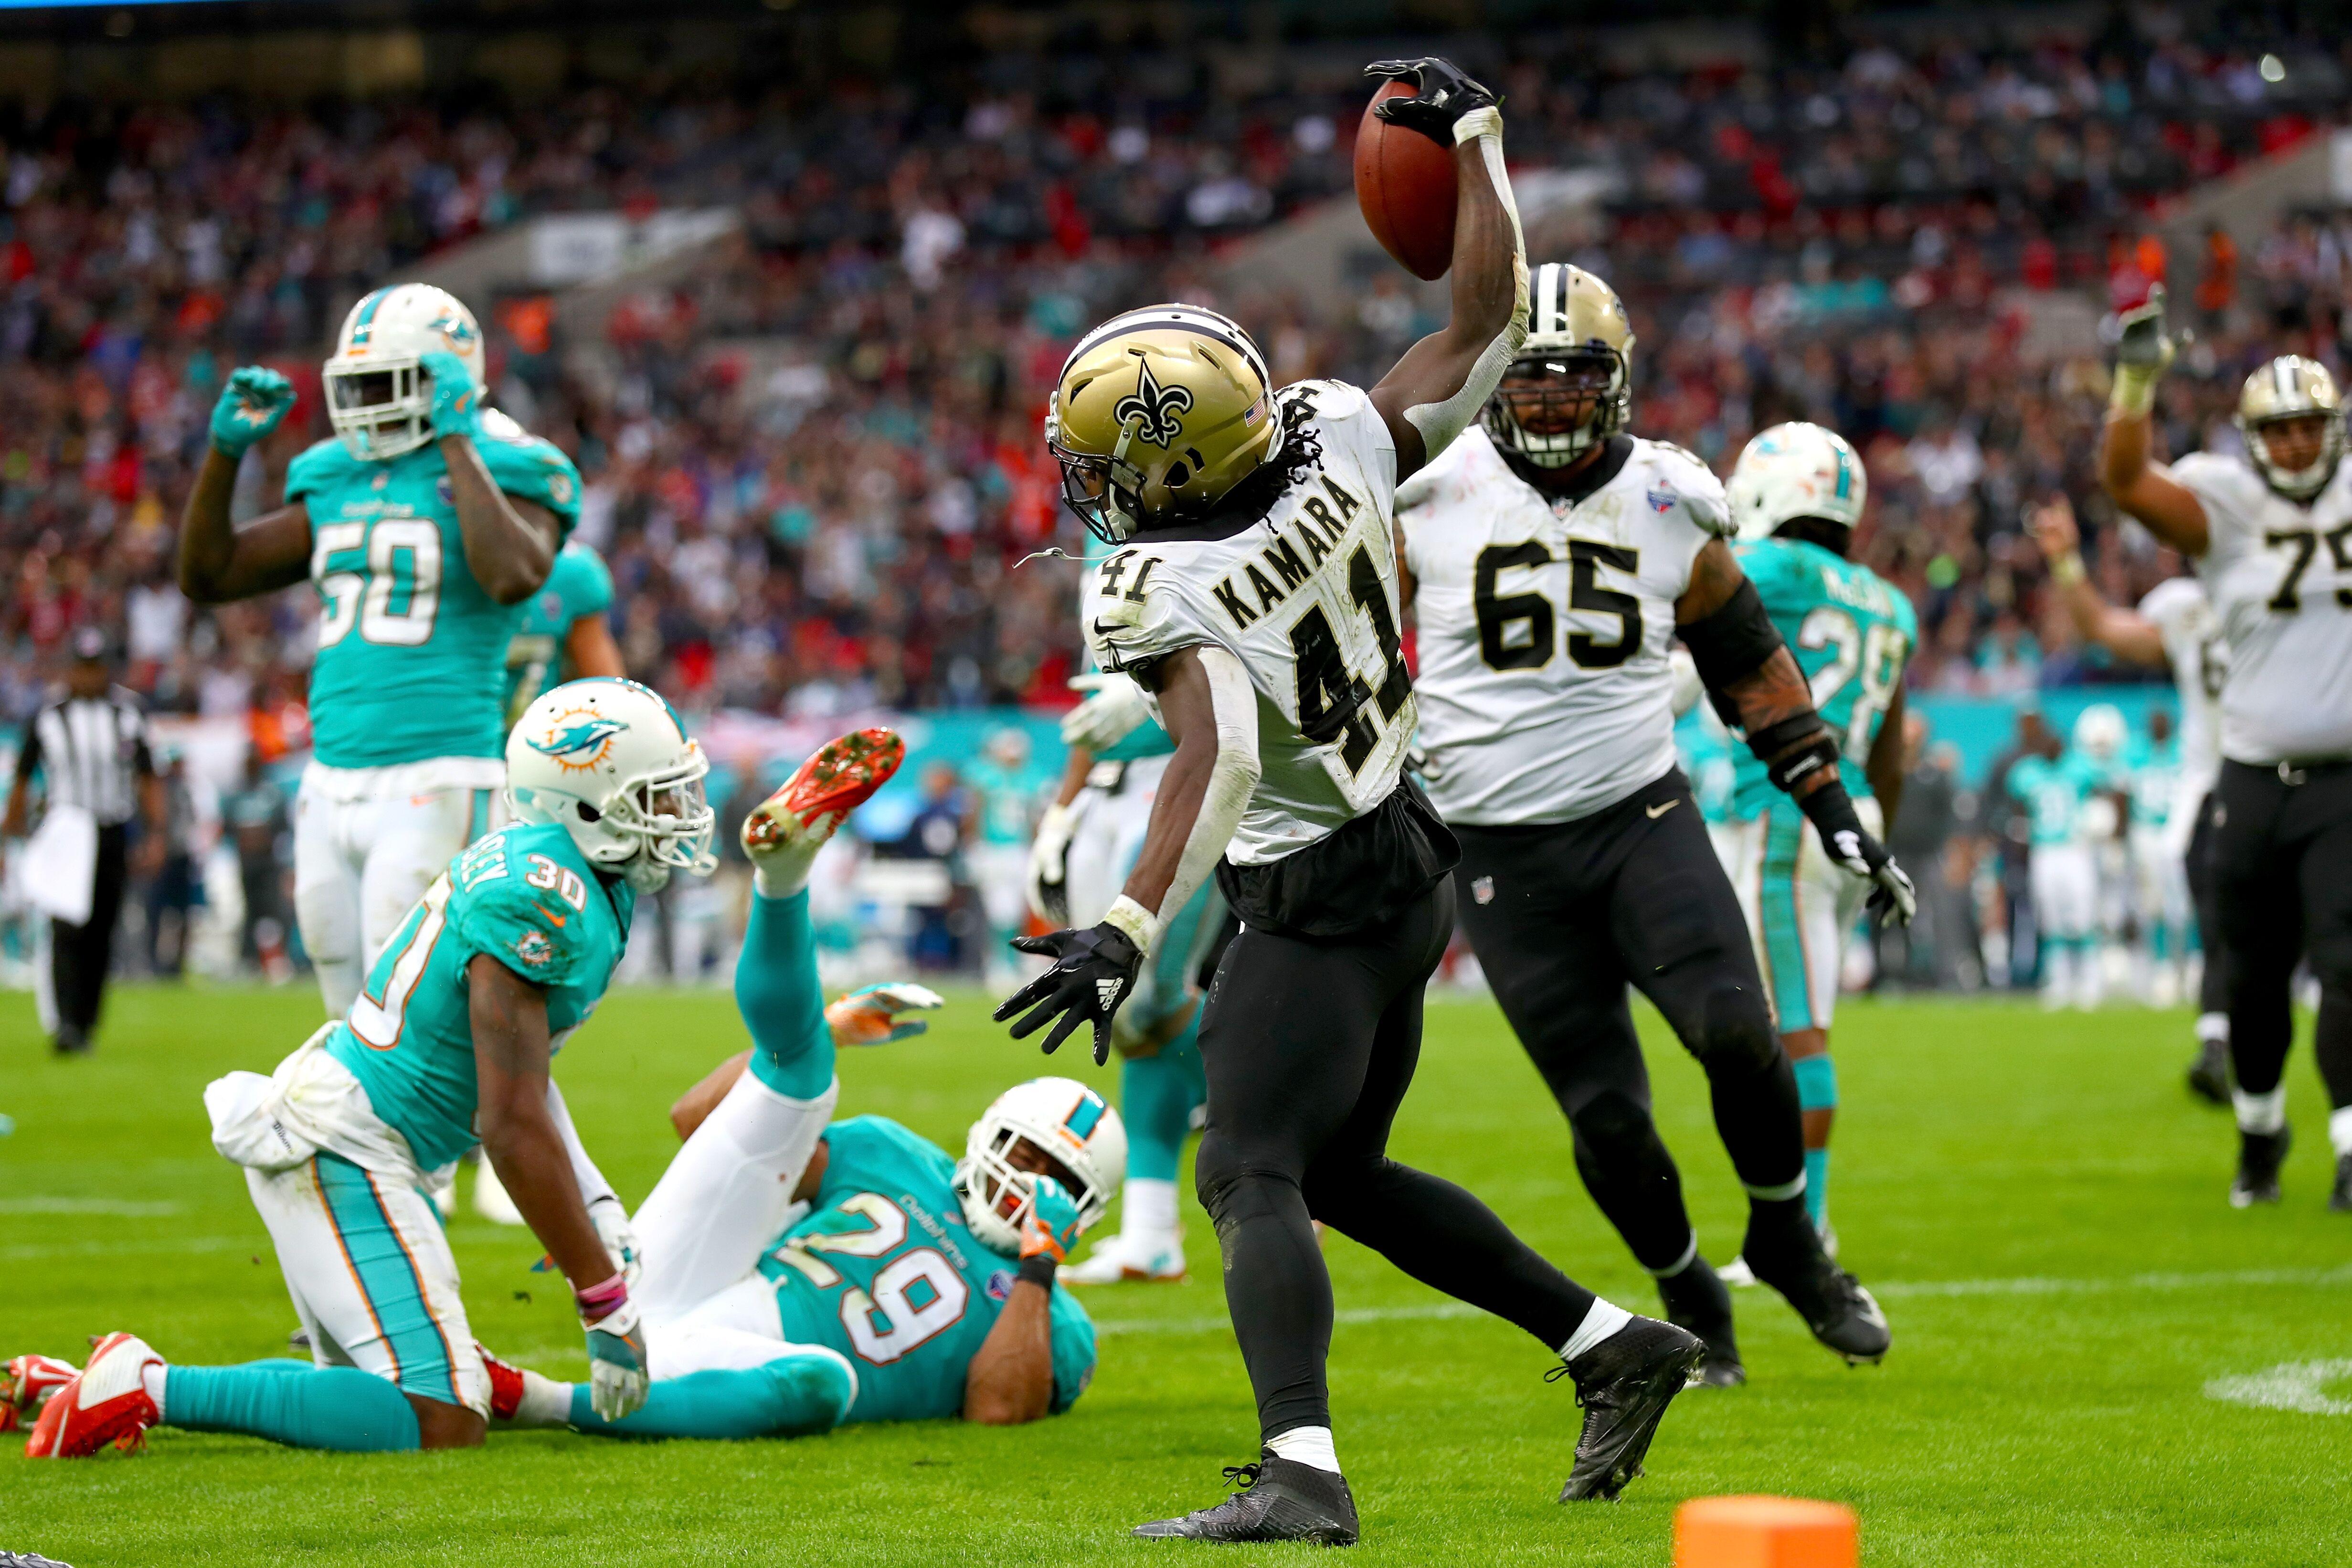 New Orleans Saints: Alvin Kamara's fantasy value rising